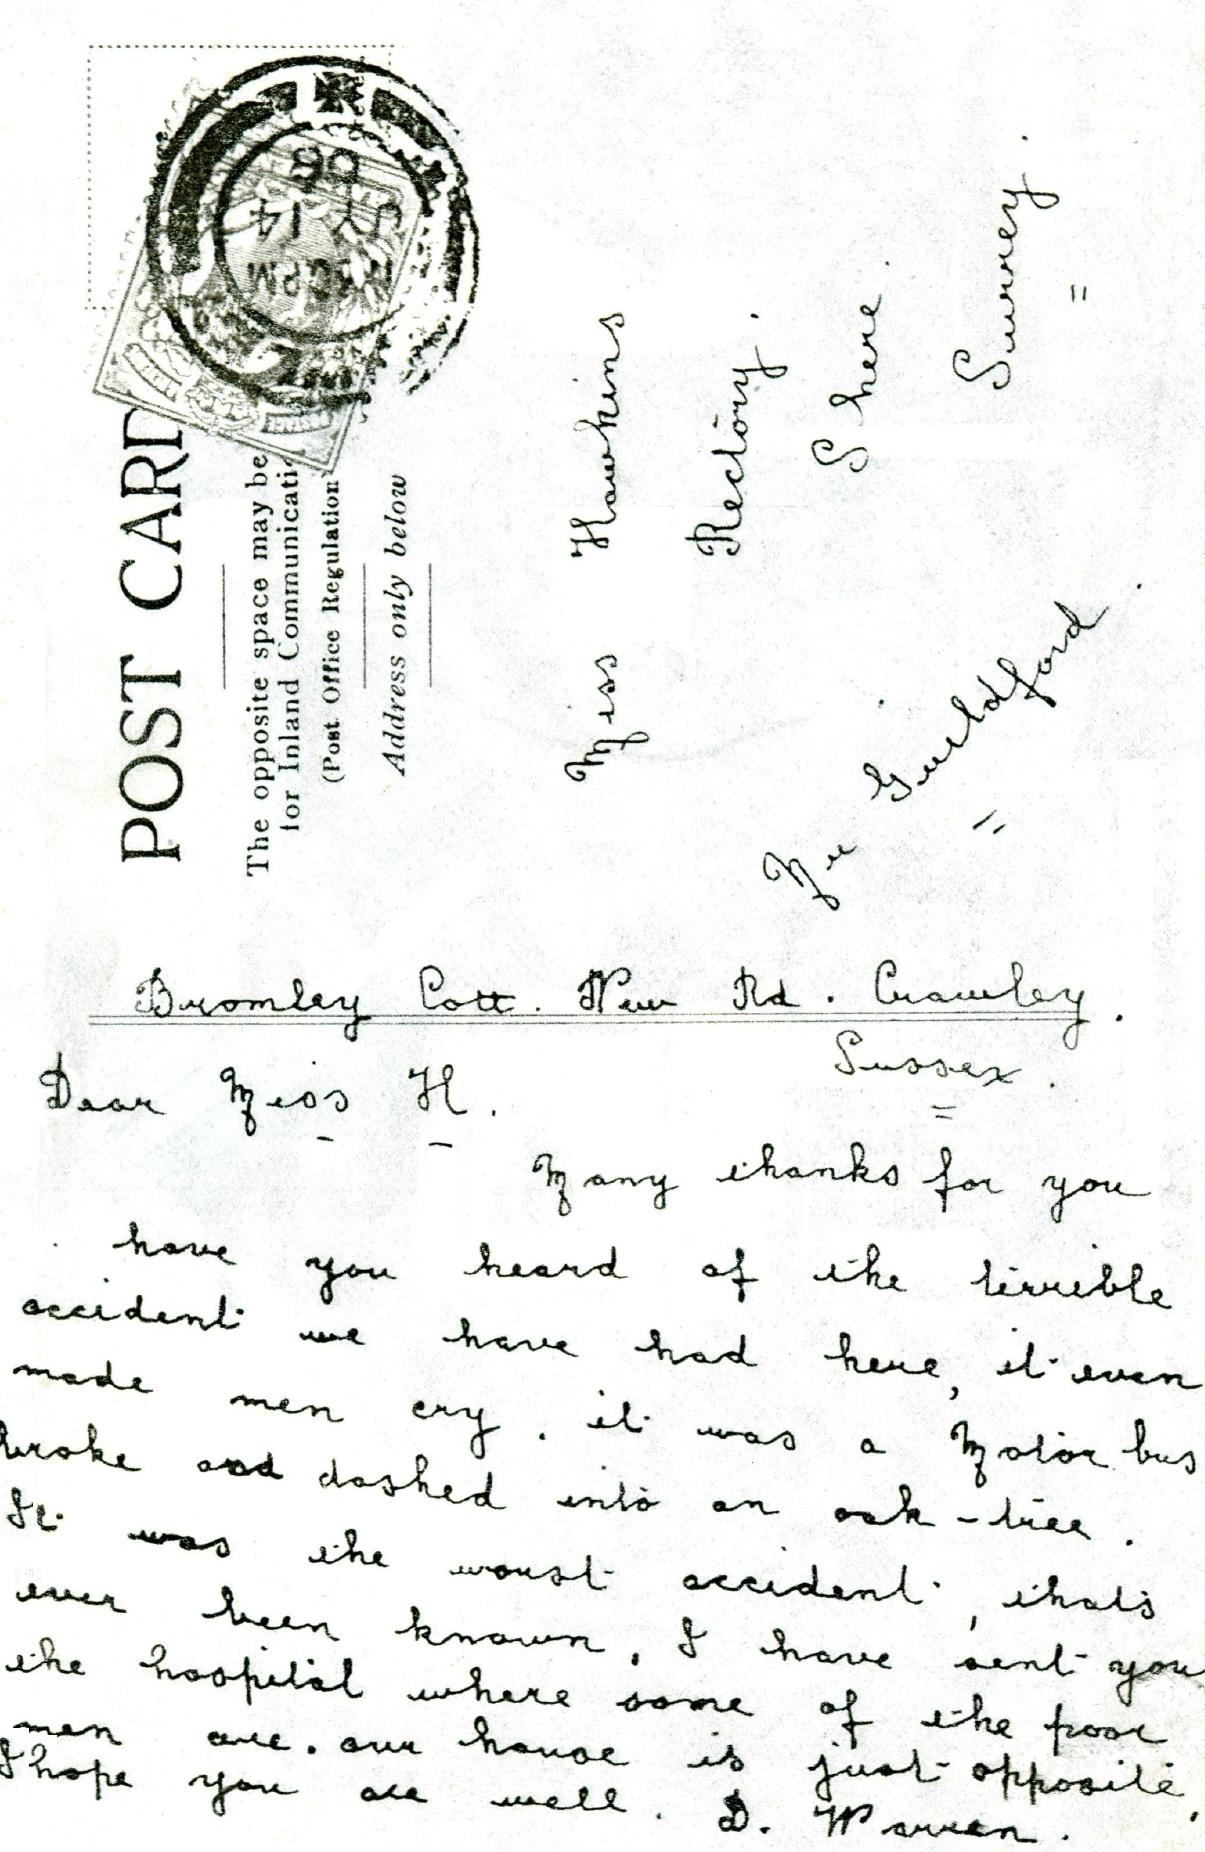 Dear miss robinson - 1 part 1